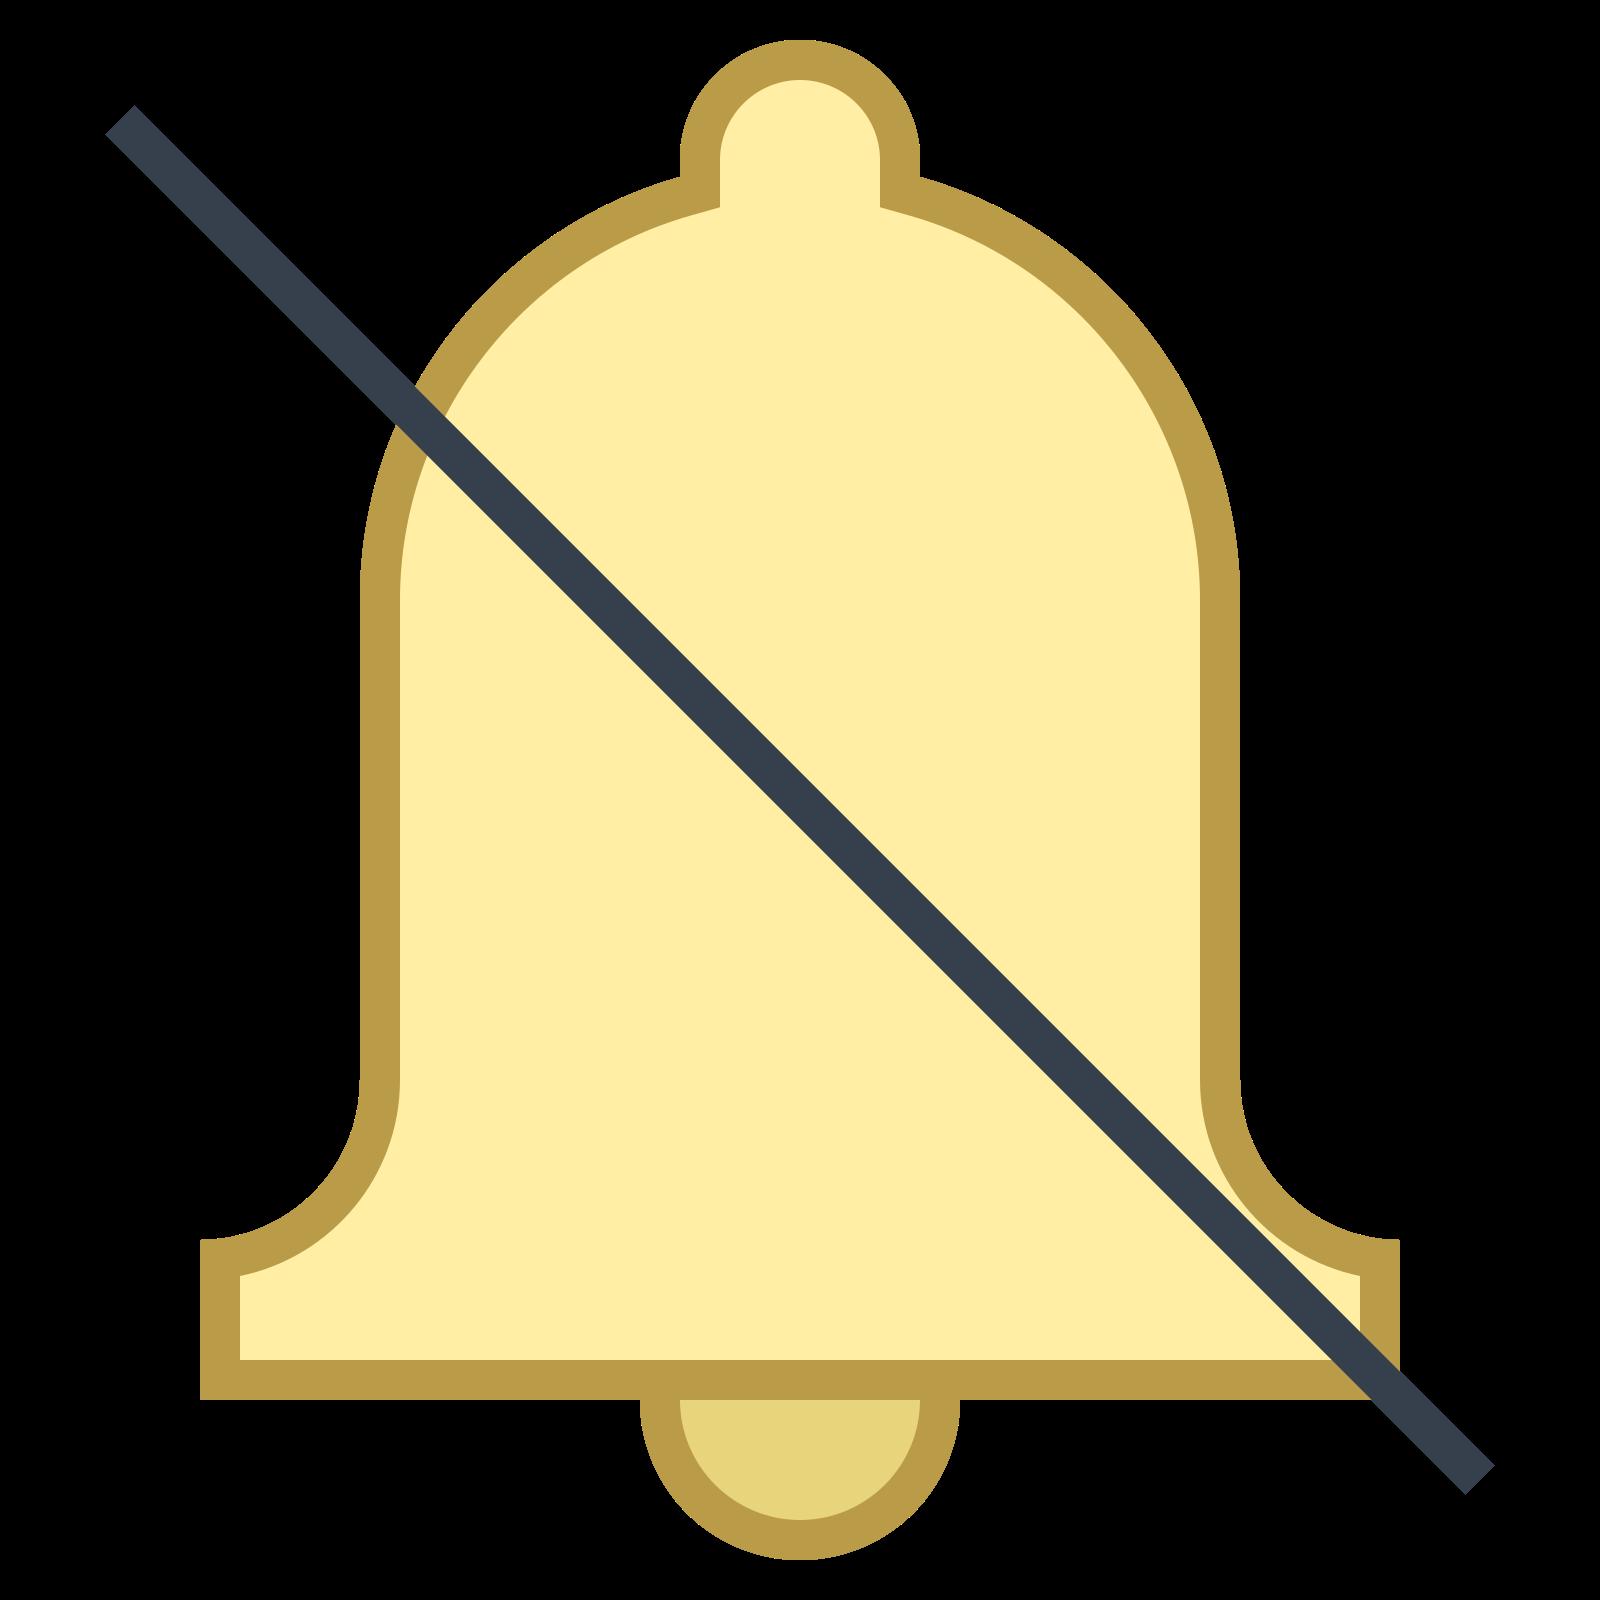 No Reminders icon